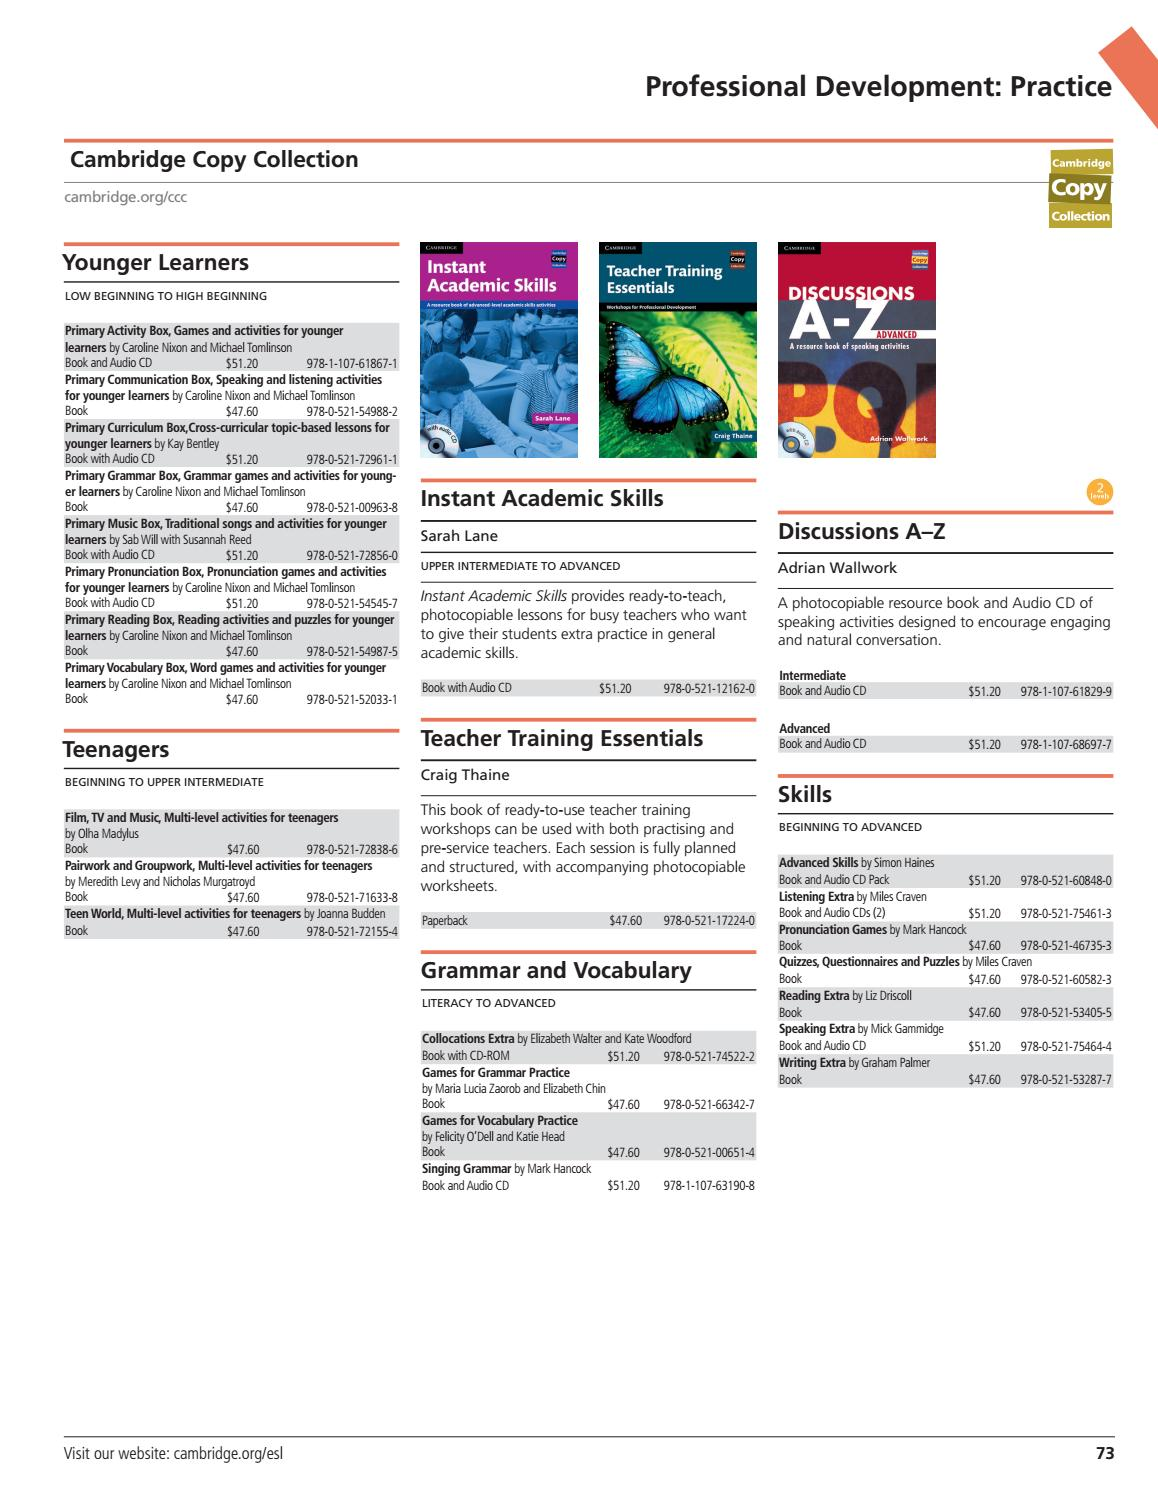 Cambridge University Press - 2017 ESL Catalog - United States by Cambridge  University Press - issuu